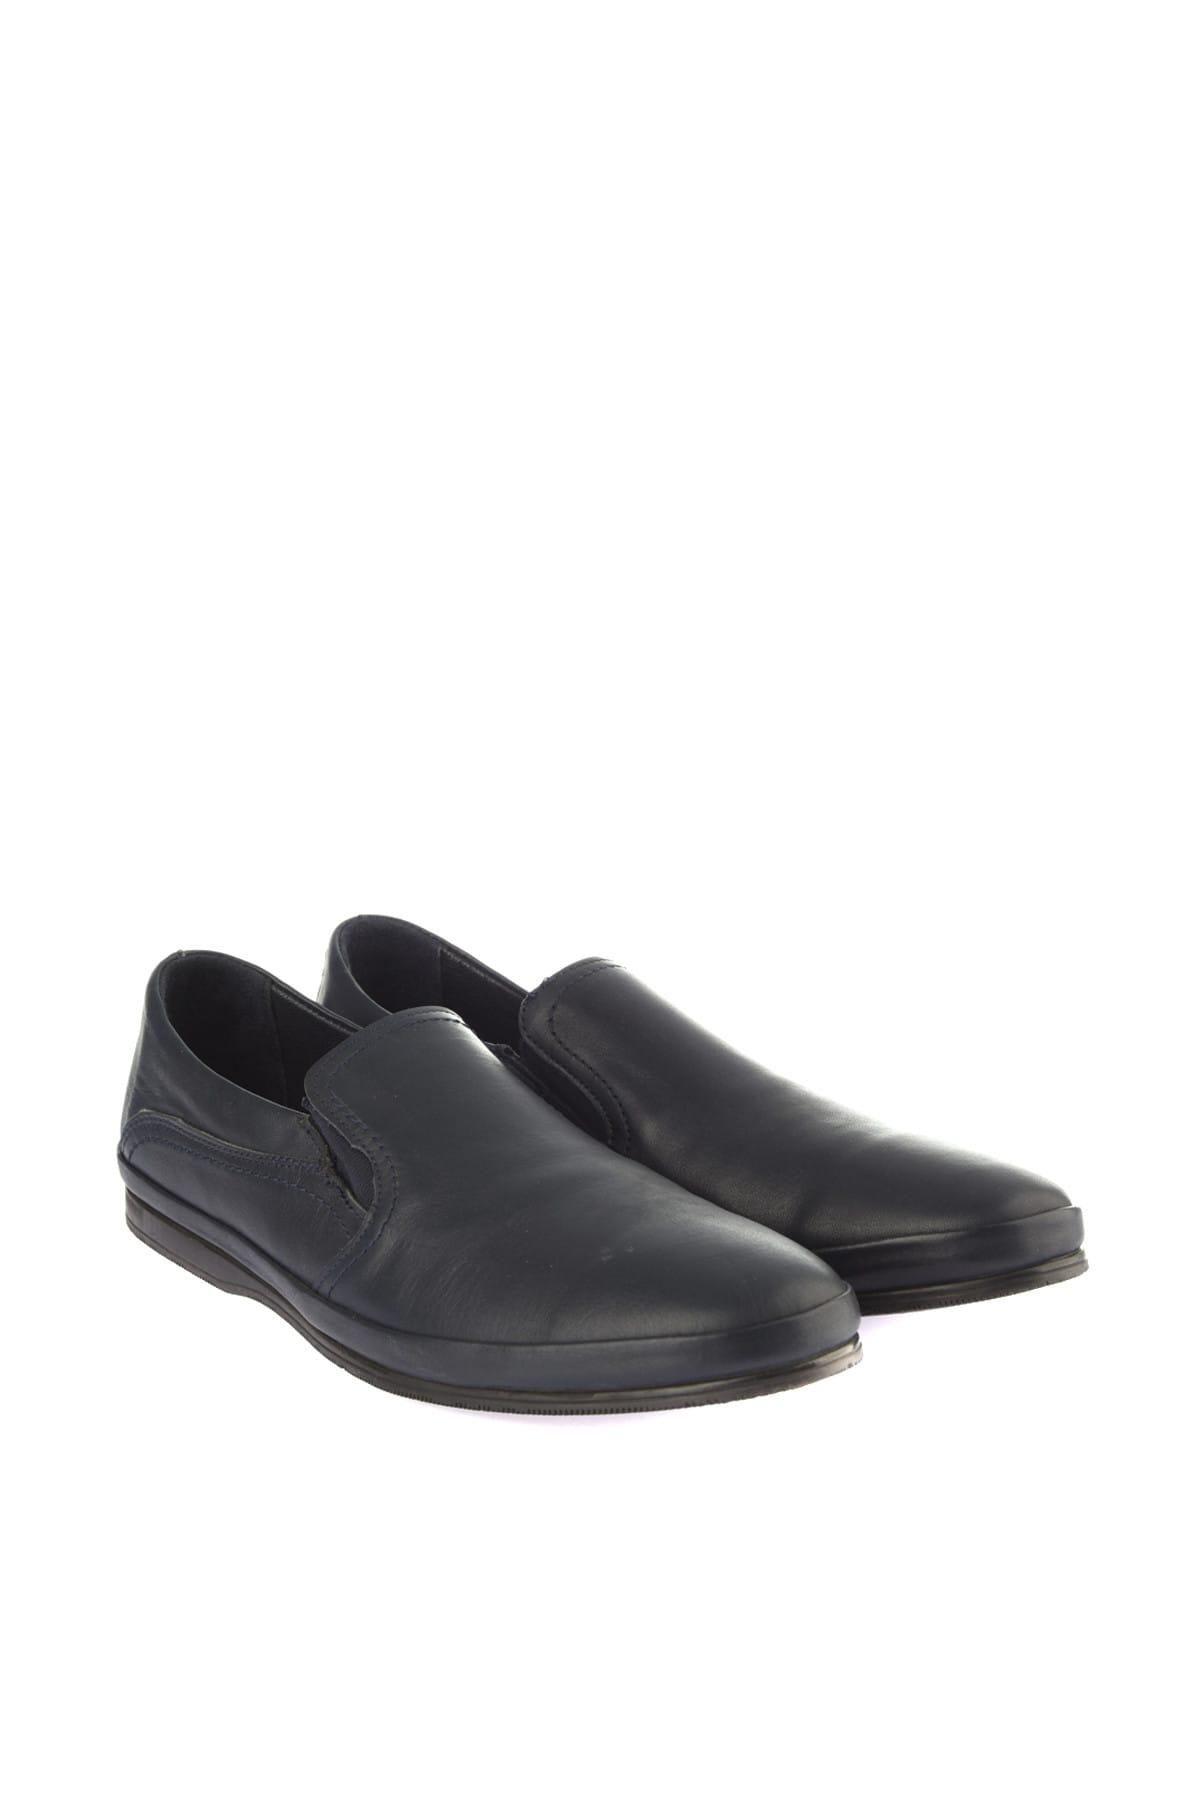 Perle Herren Loafer Schuhe 120130008407